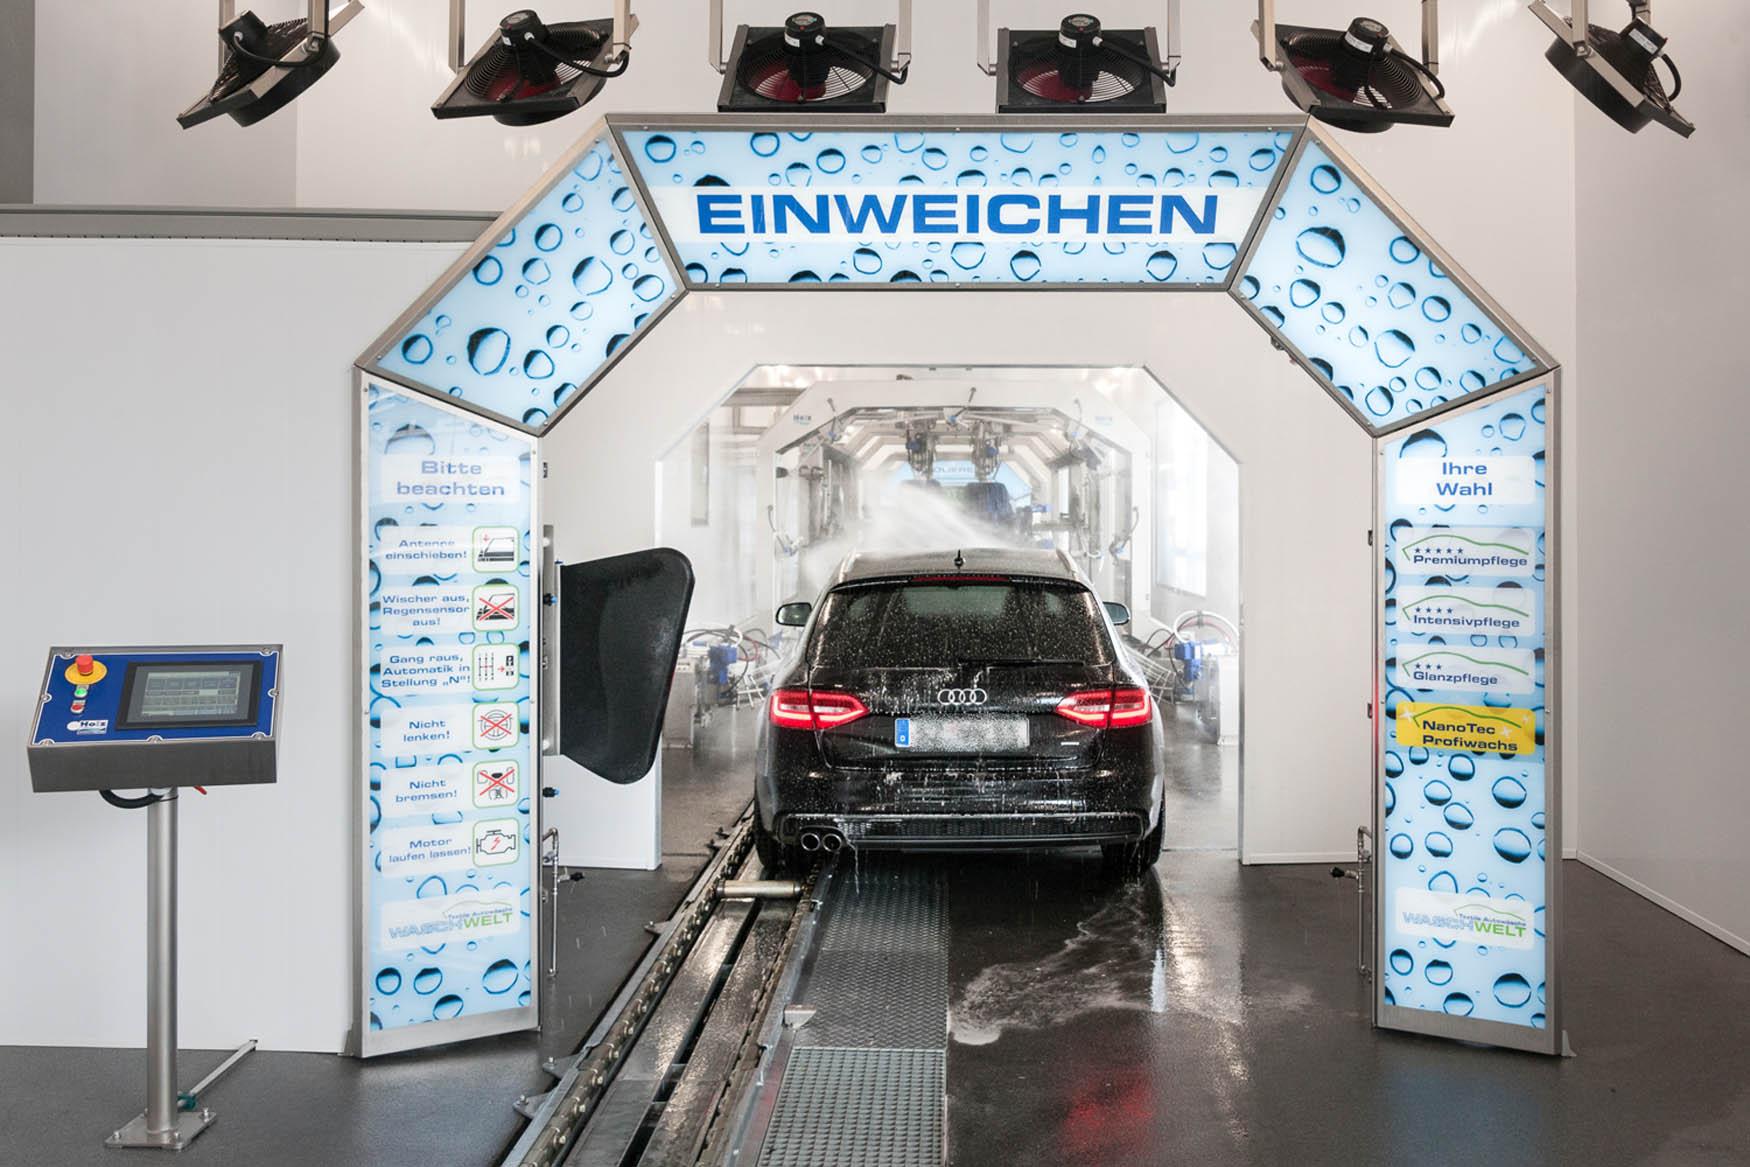 Marlow_Watson_German_Car_Wash.jpg